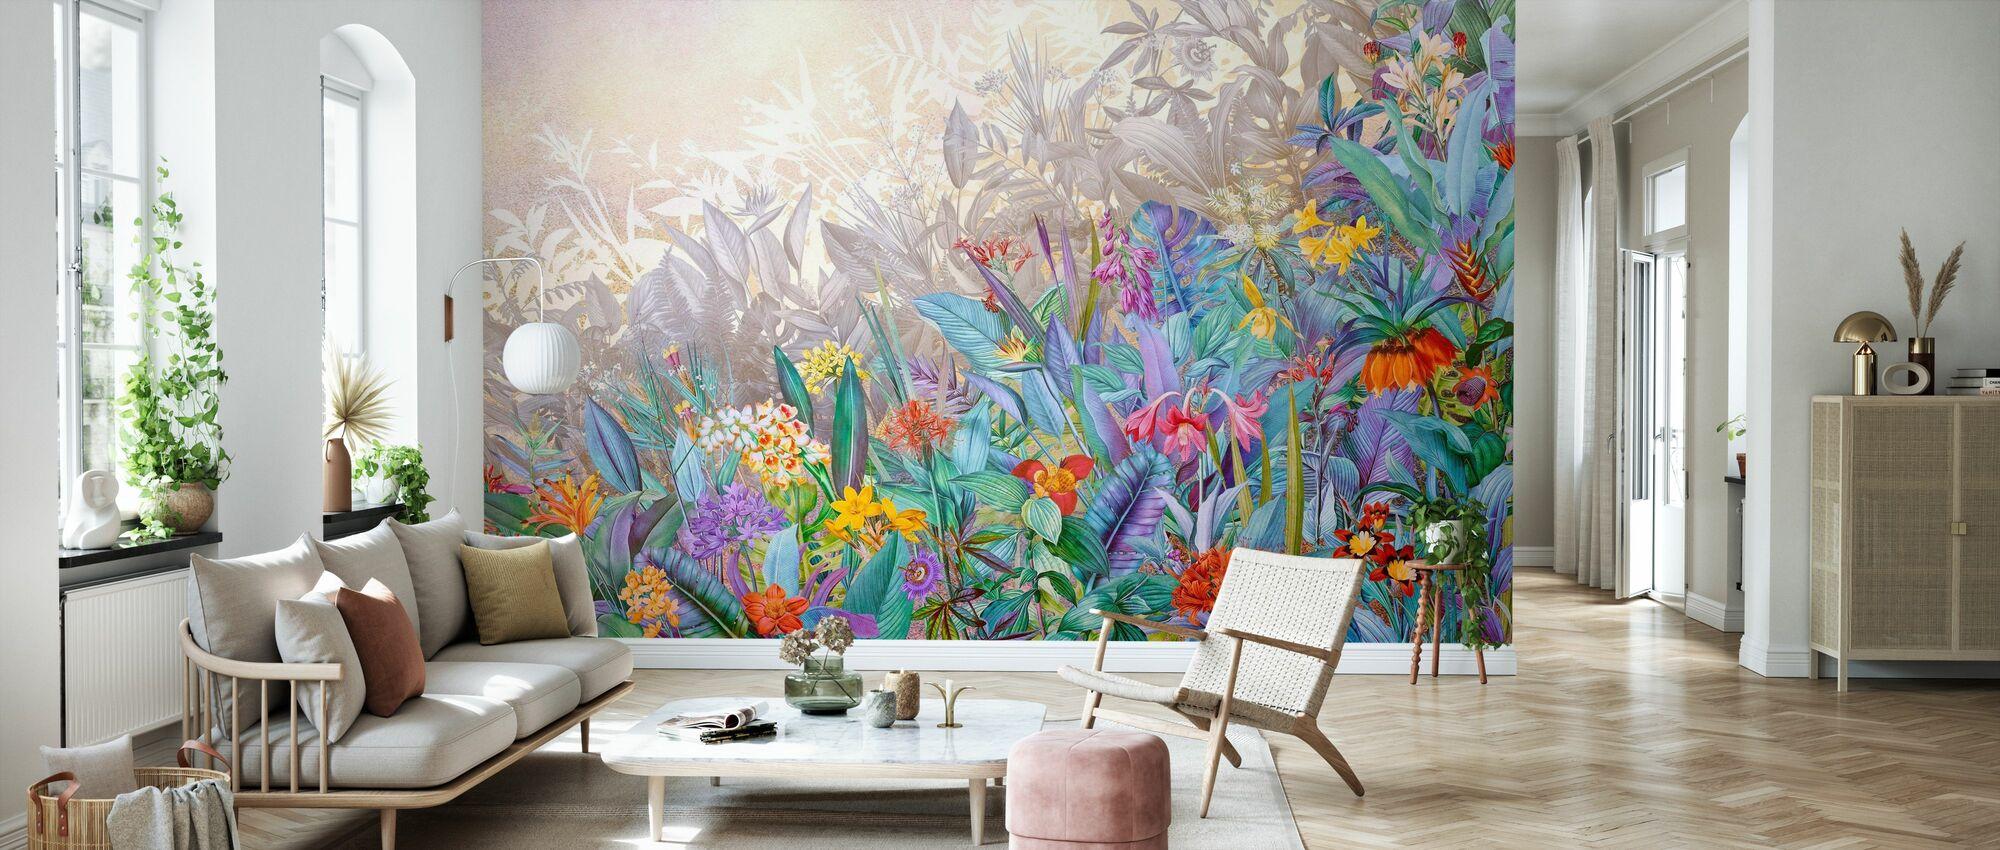 Colorful Blossom - Wallpaper - Living Room